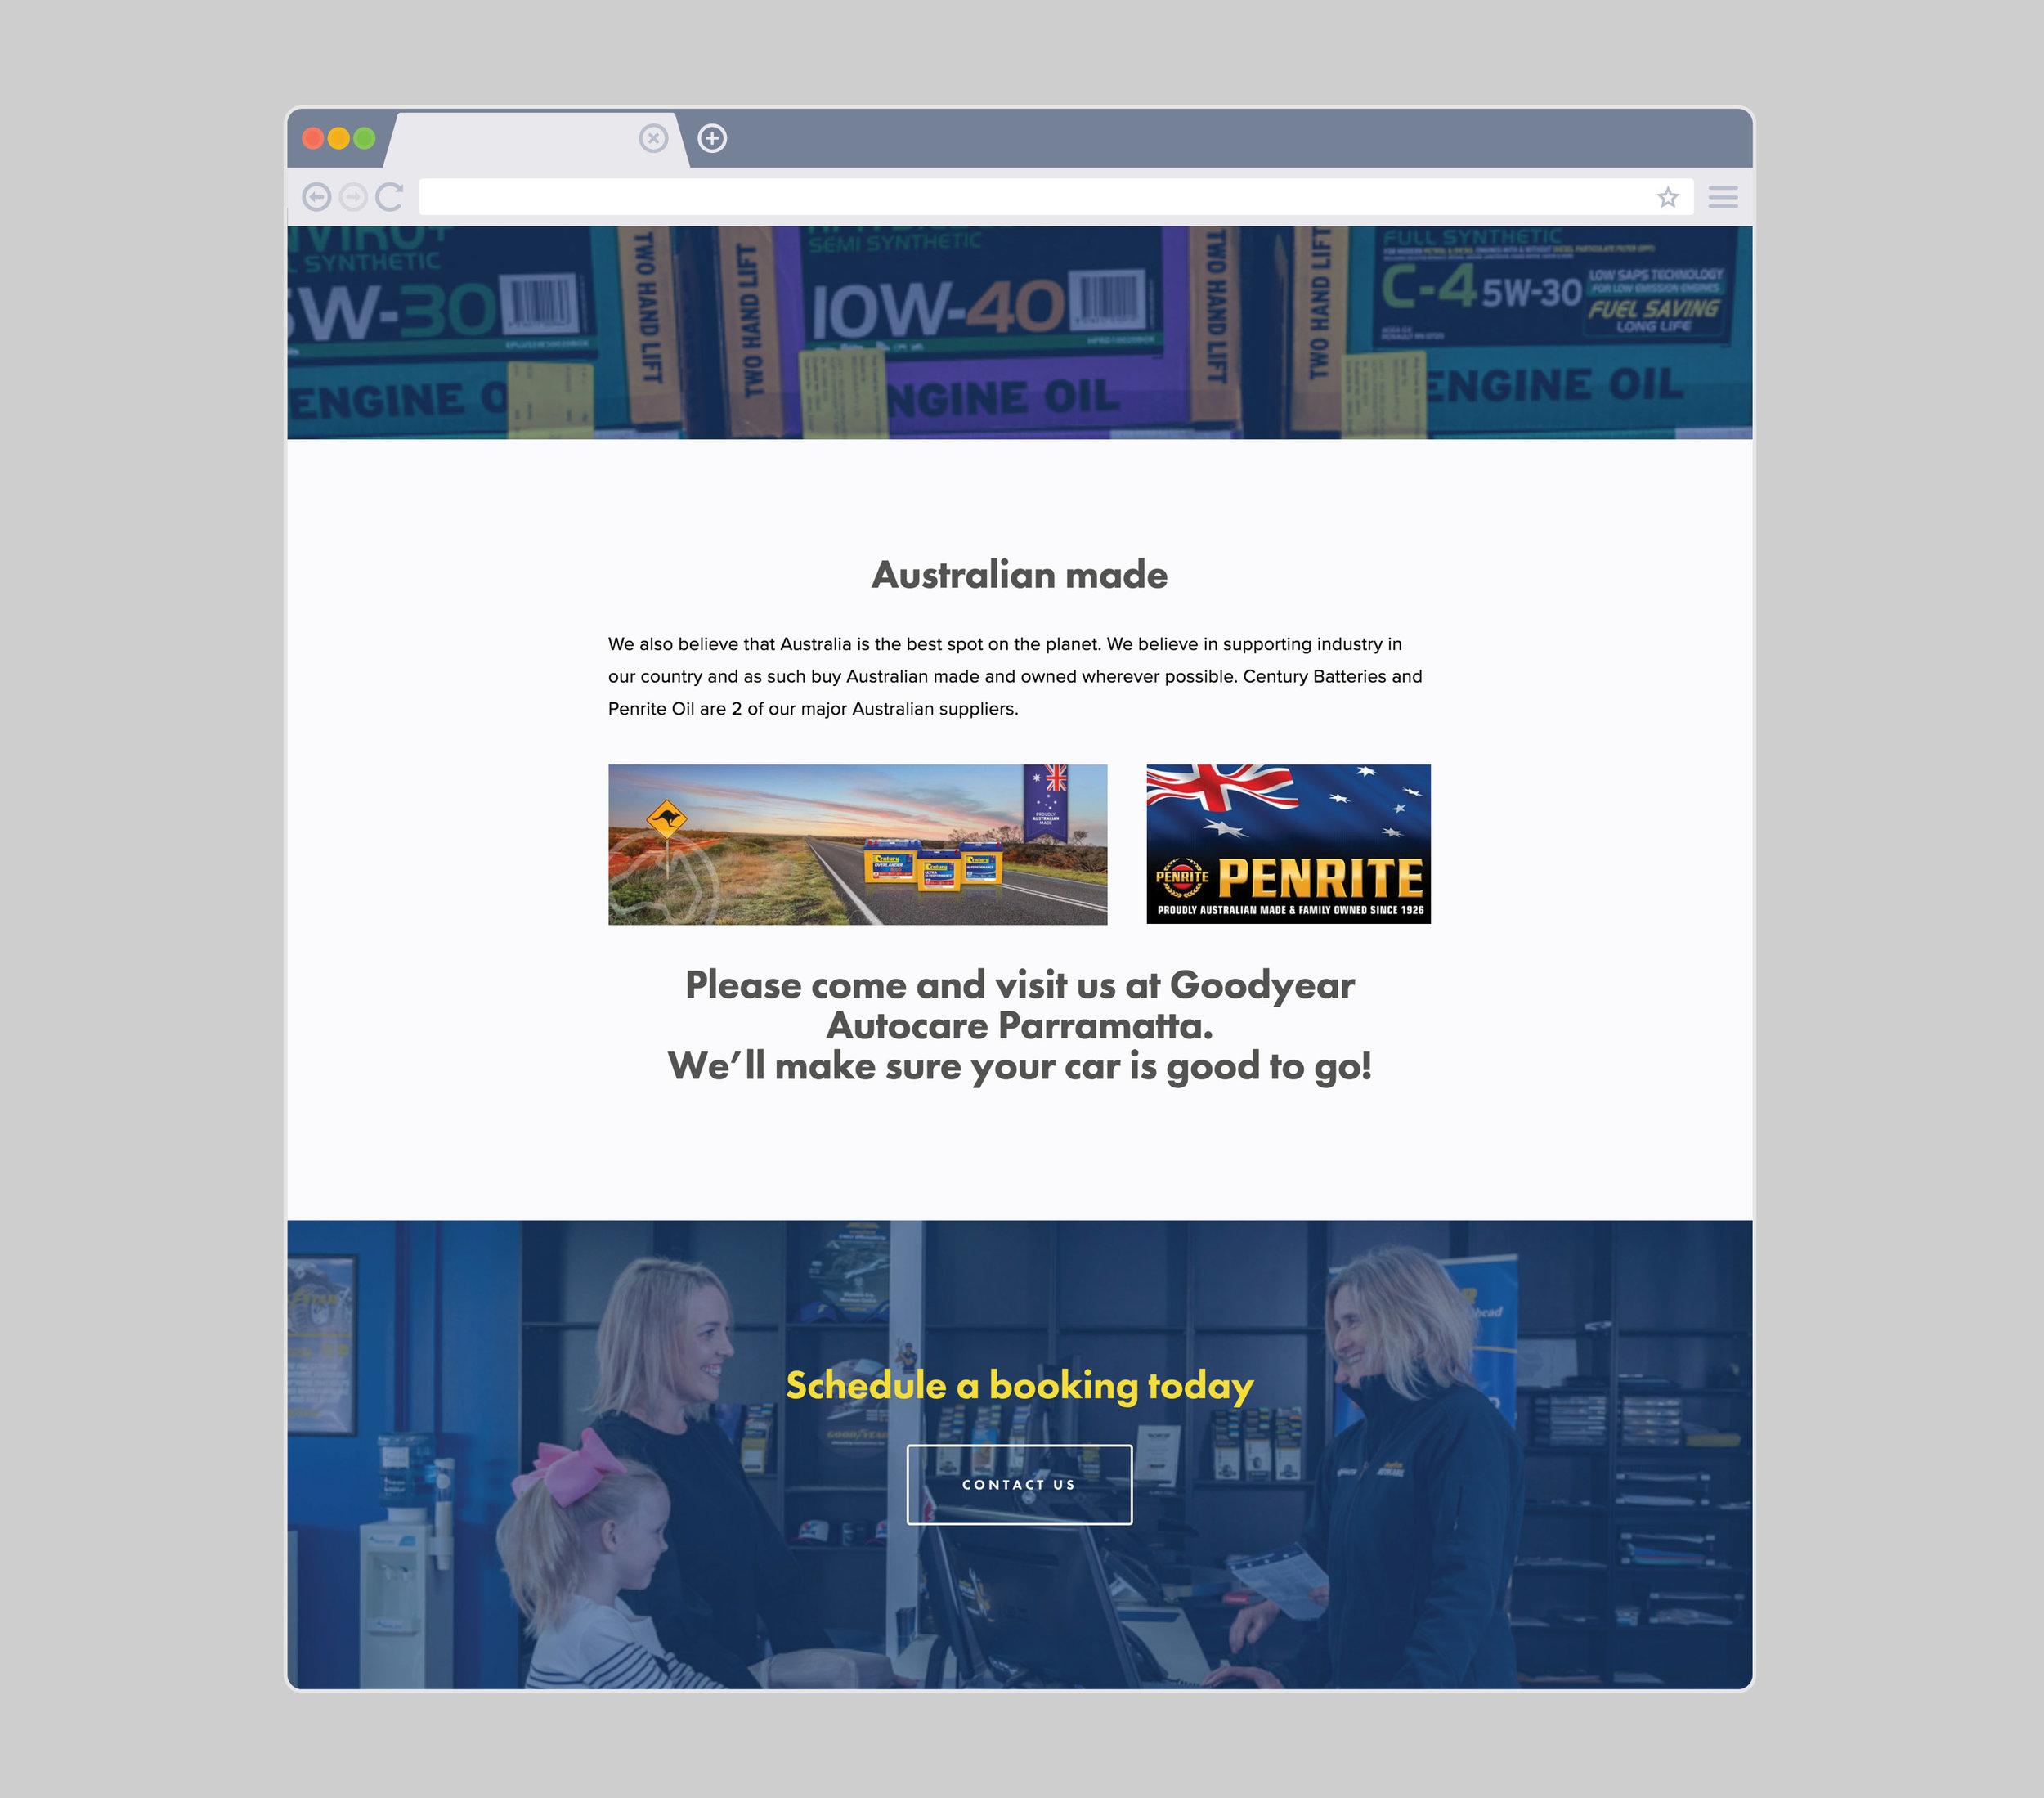 GoodyearParramatta_Flatscreen_web.jpg